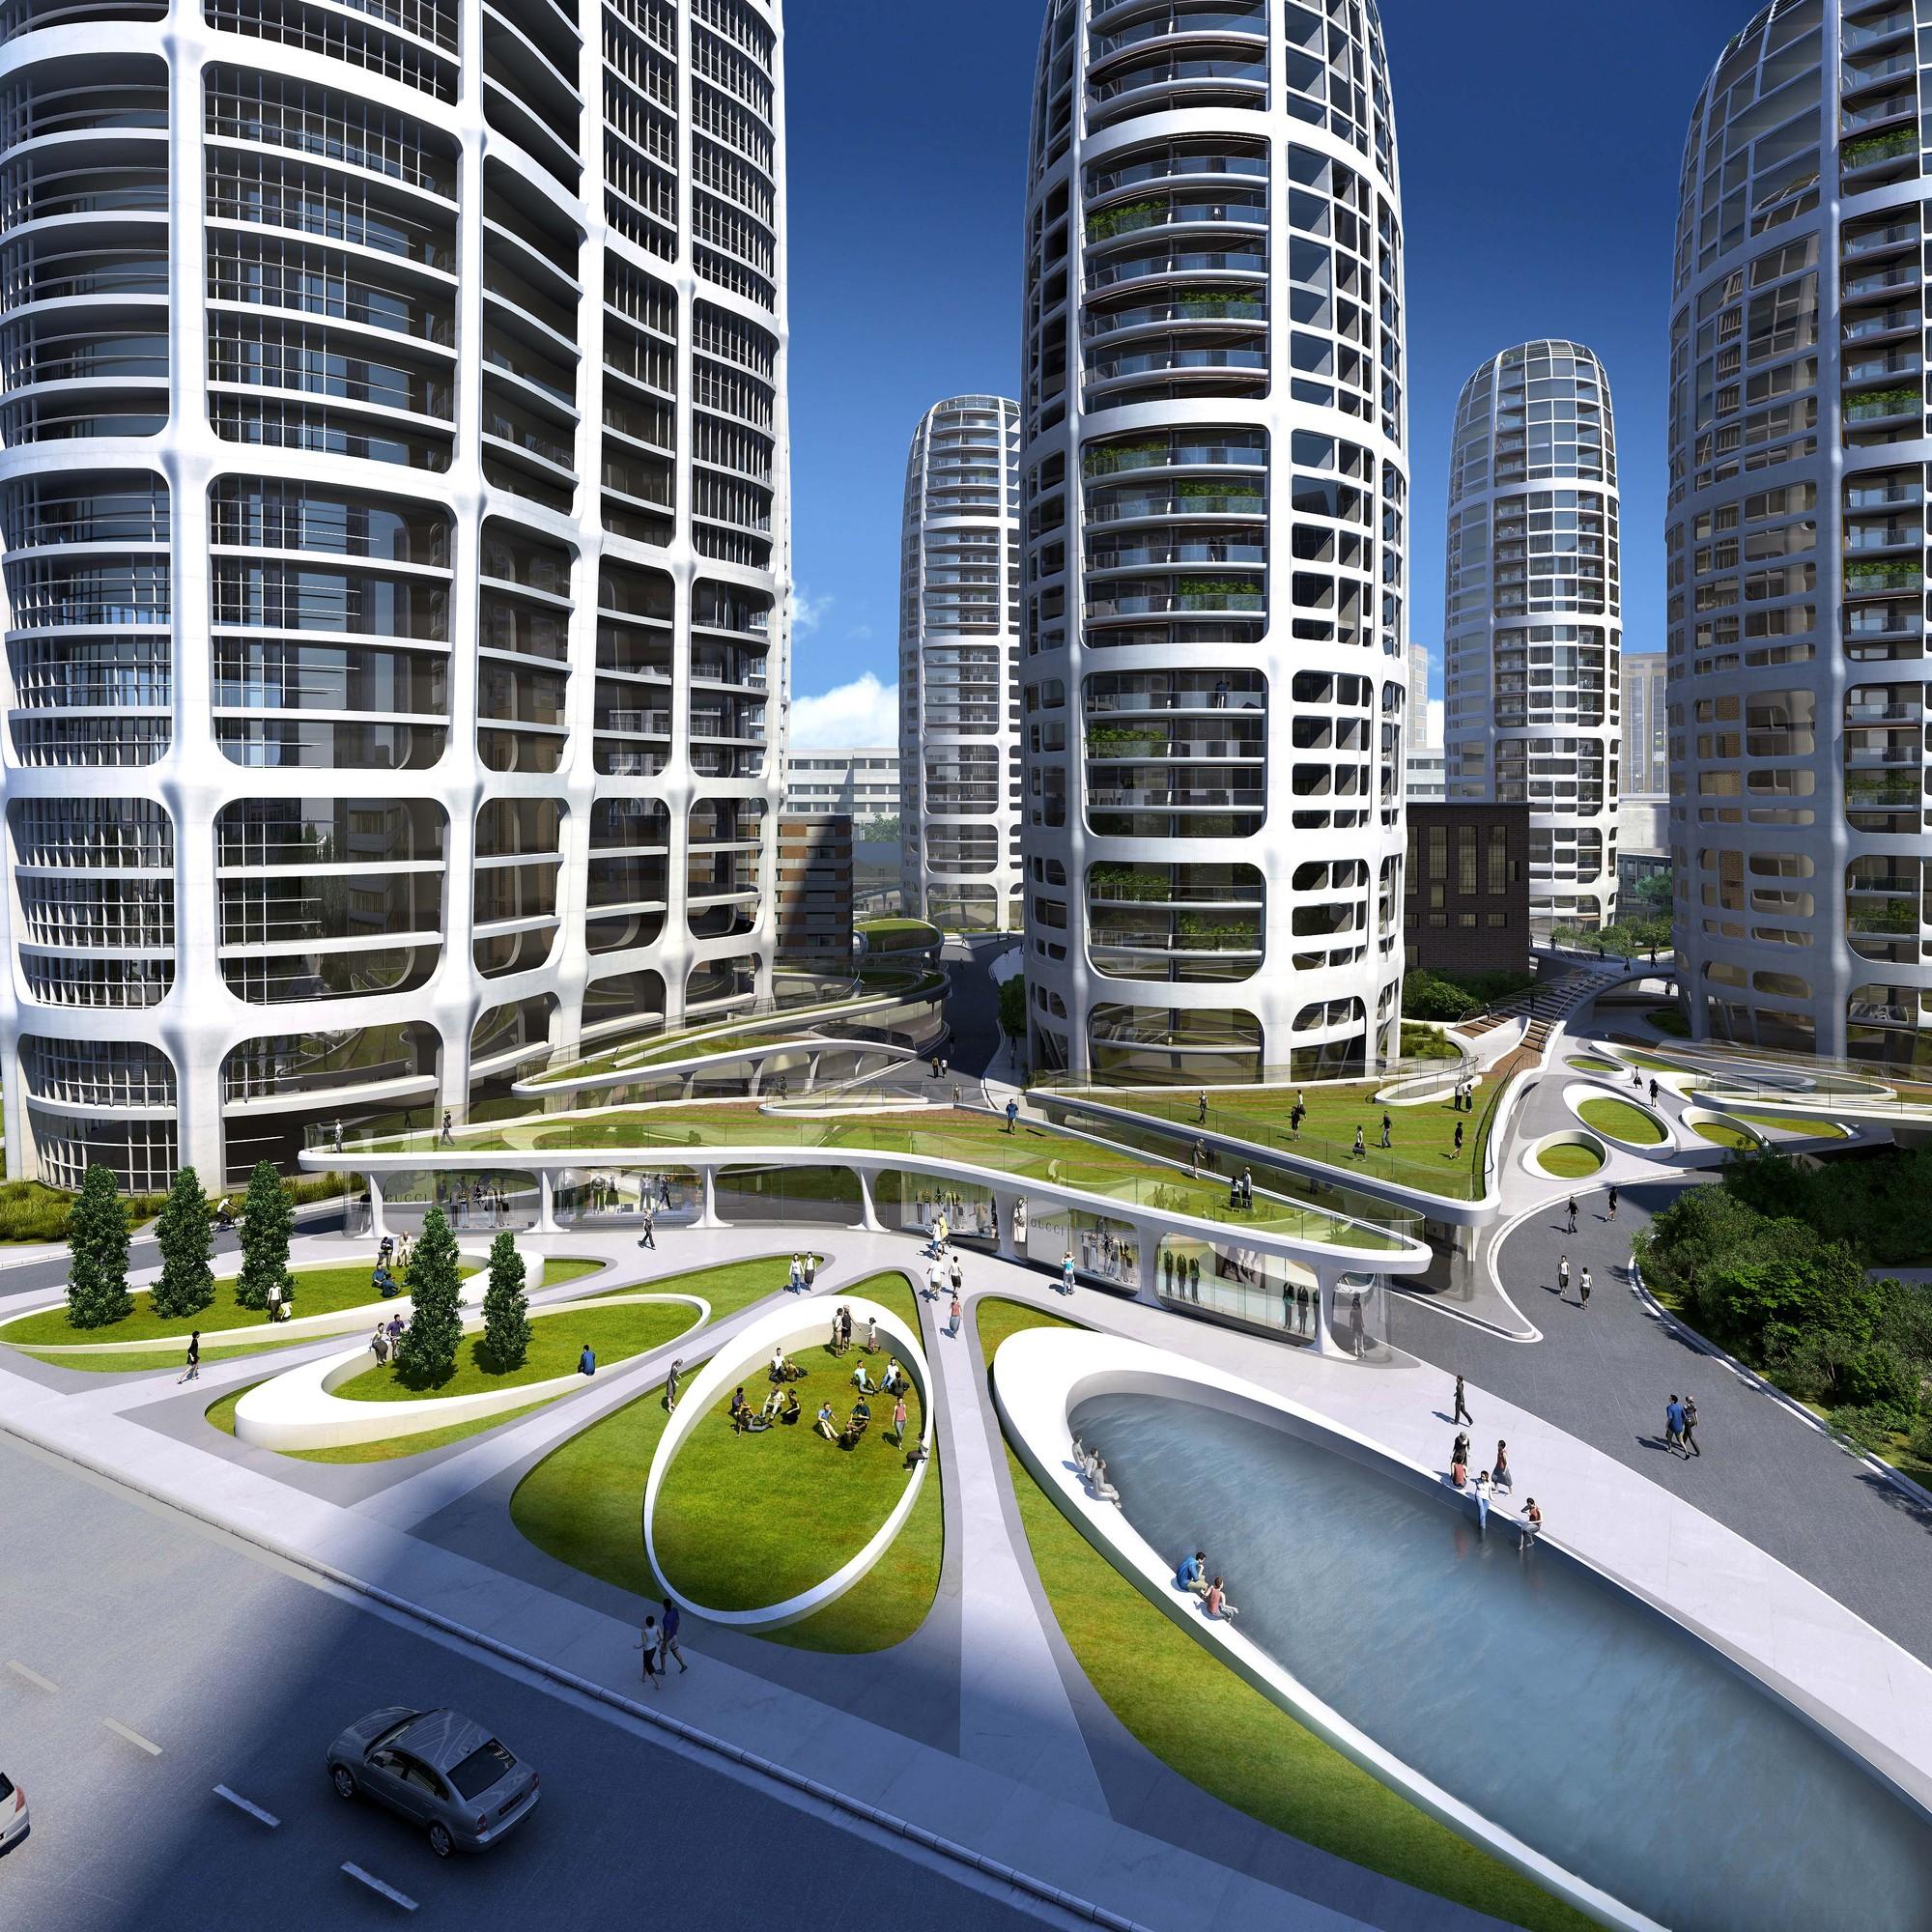 Bratislava Culenova New City Center Proposal / Zaha Hadid Architects